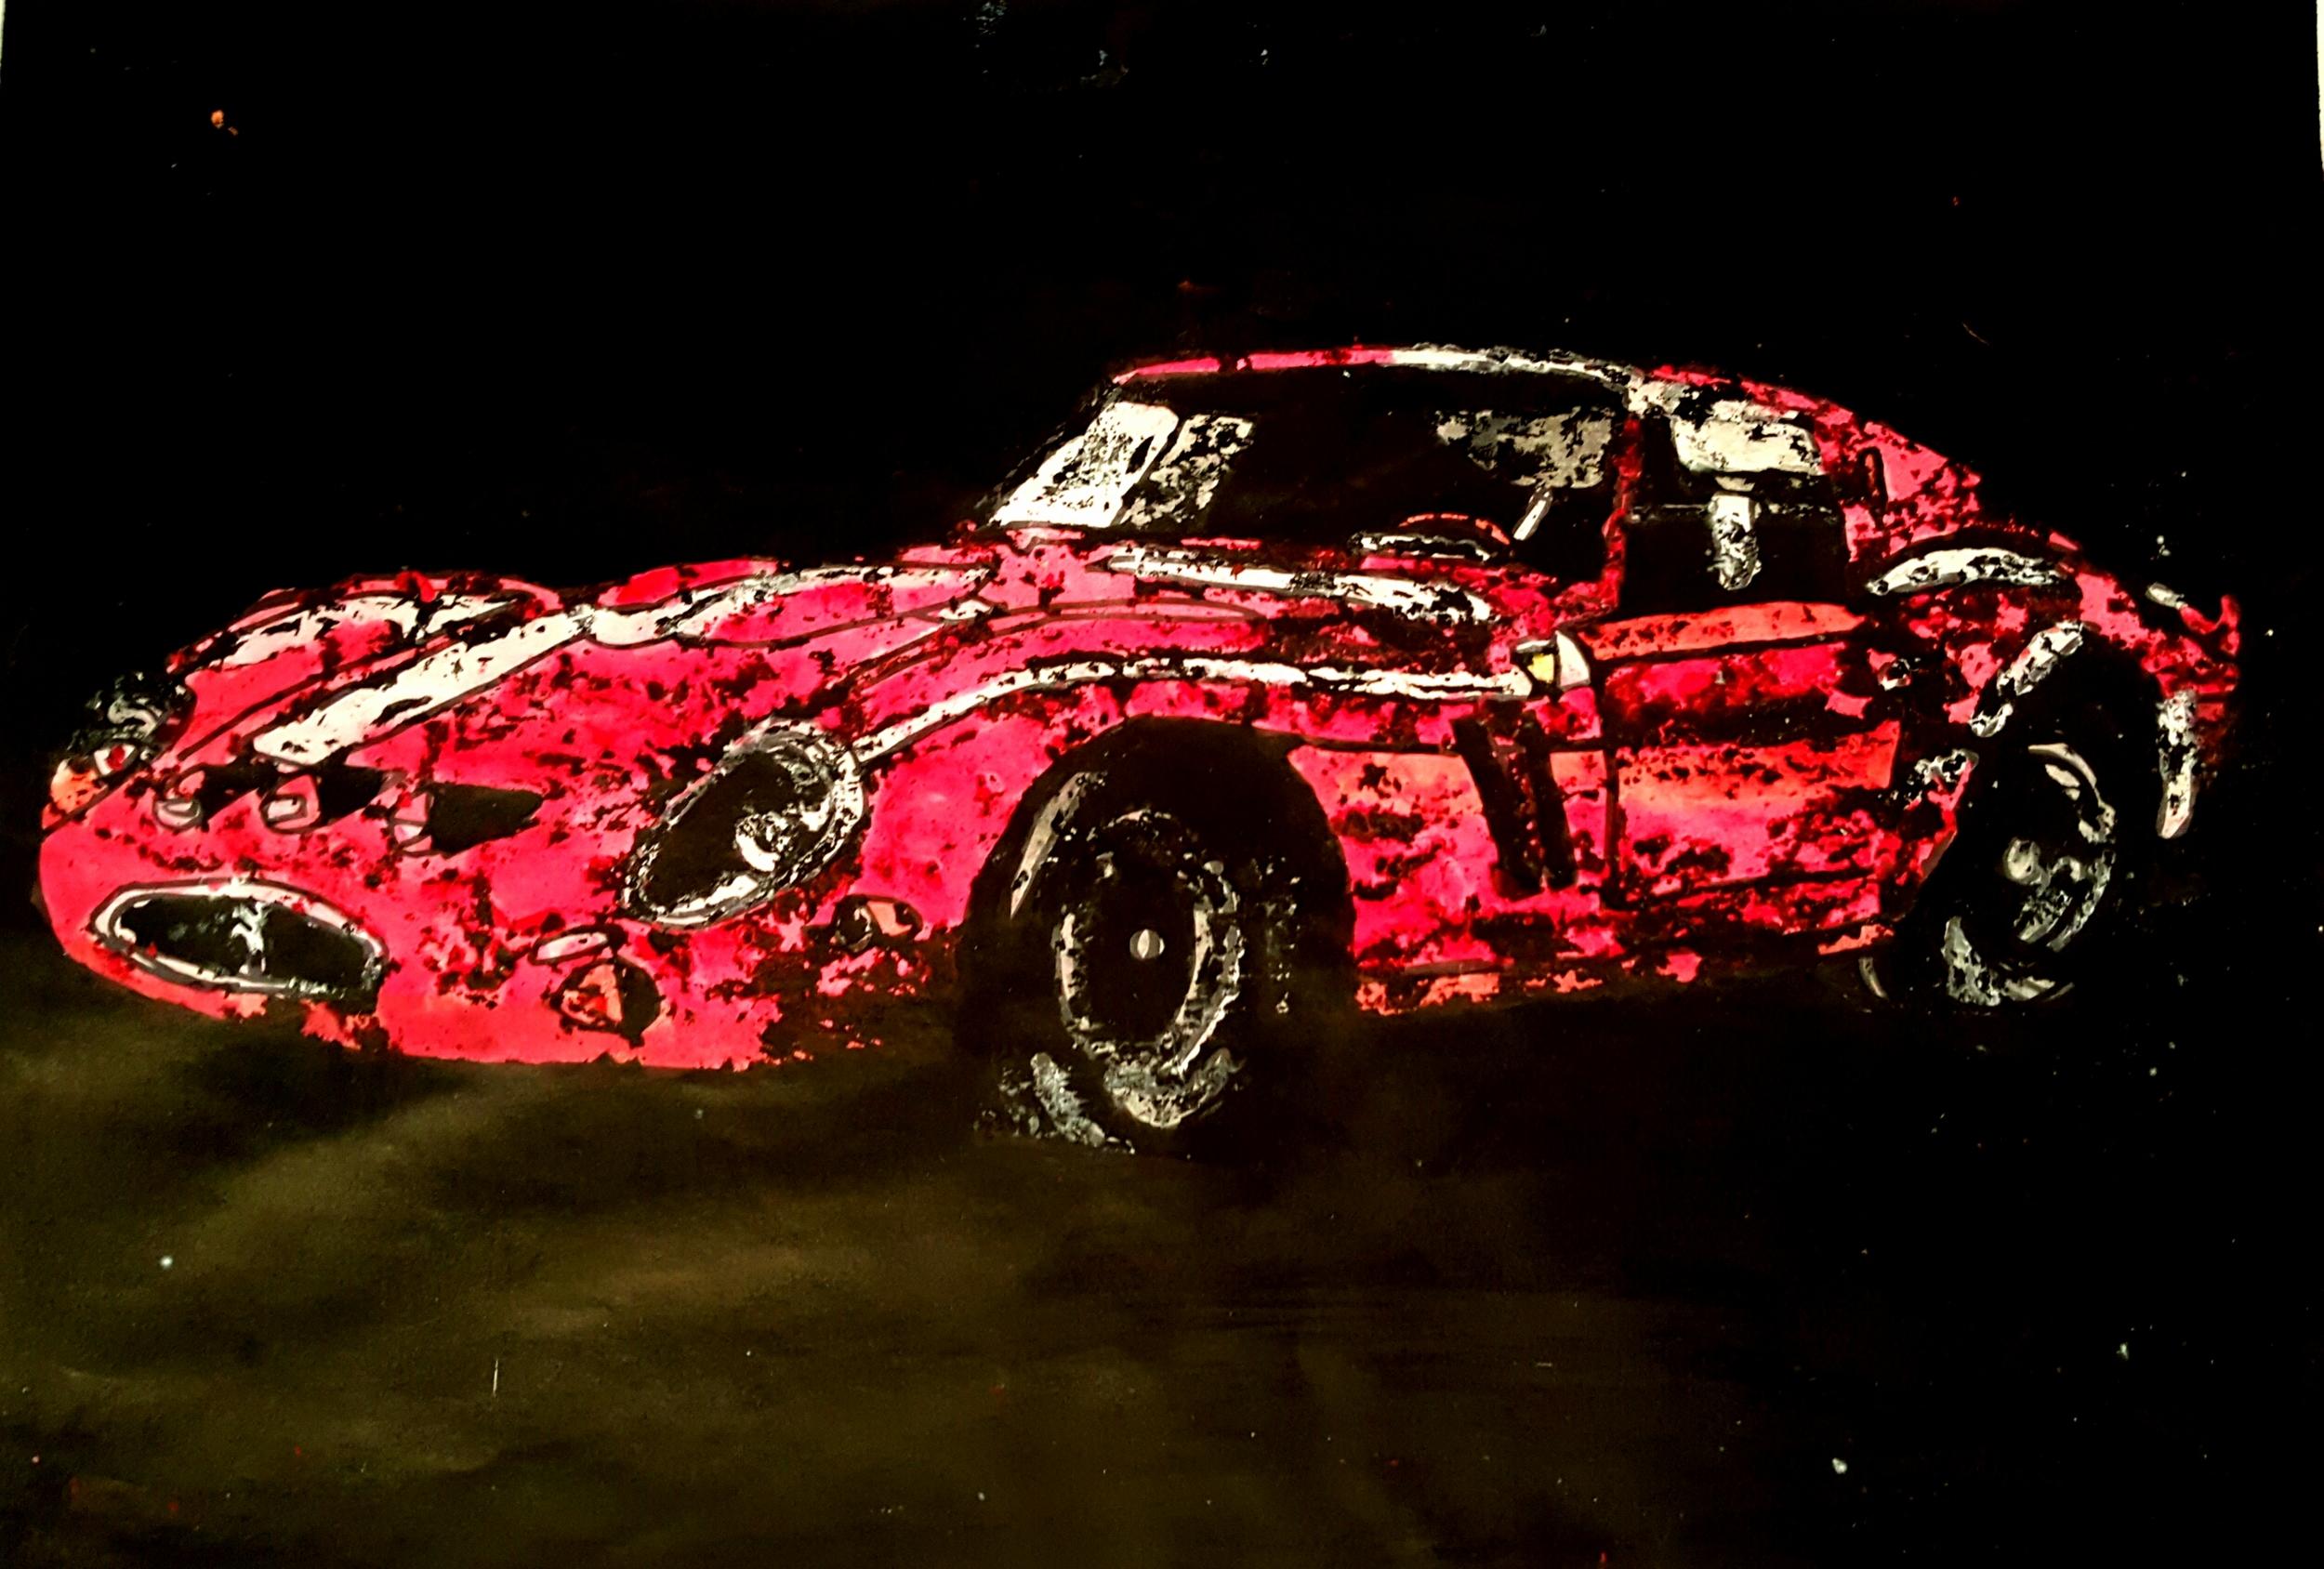 'Ferrari' By Theo Blank '18